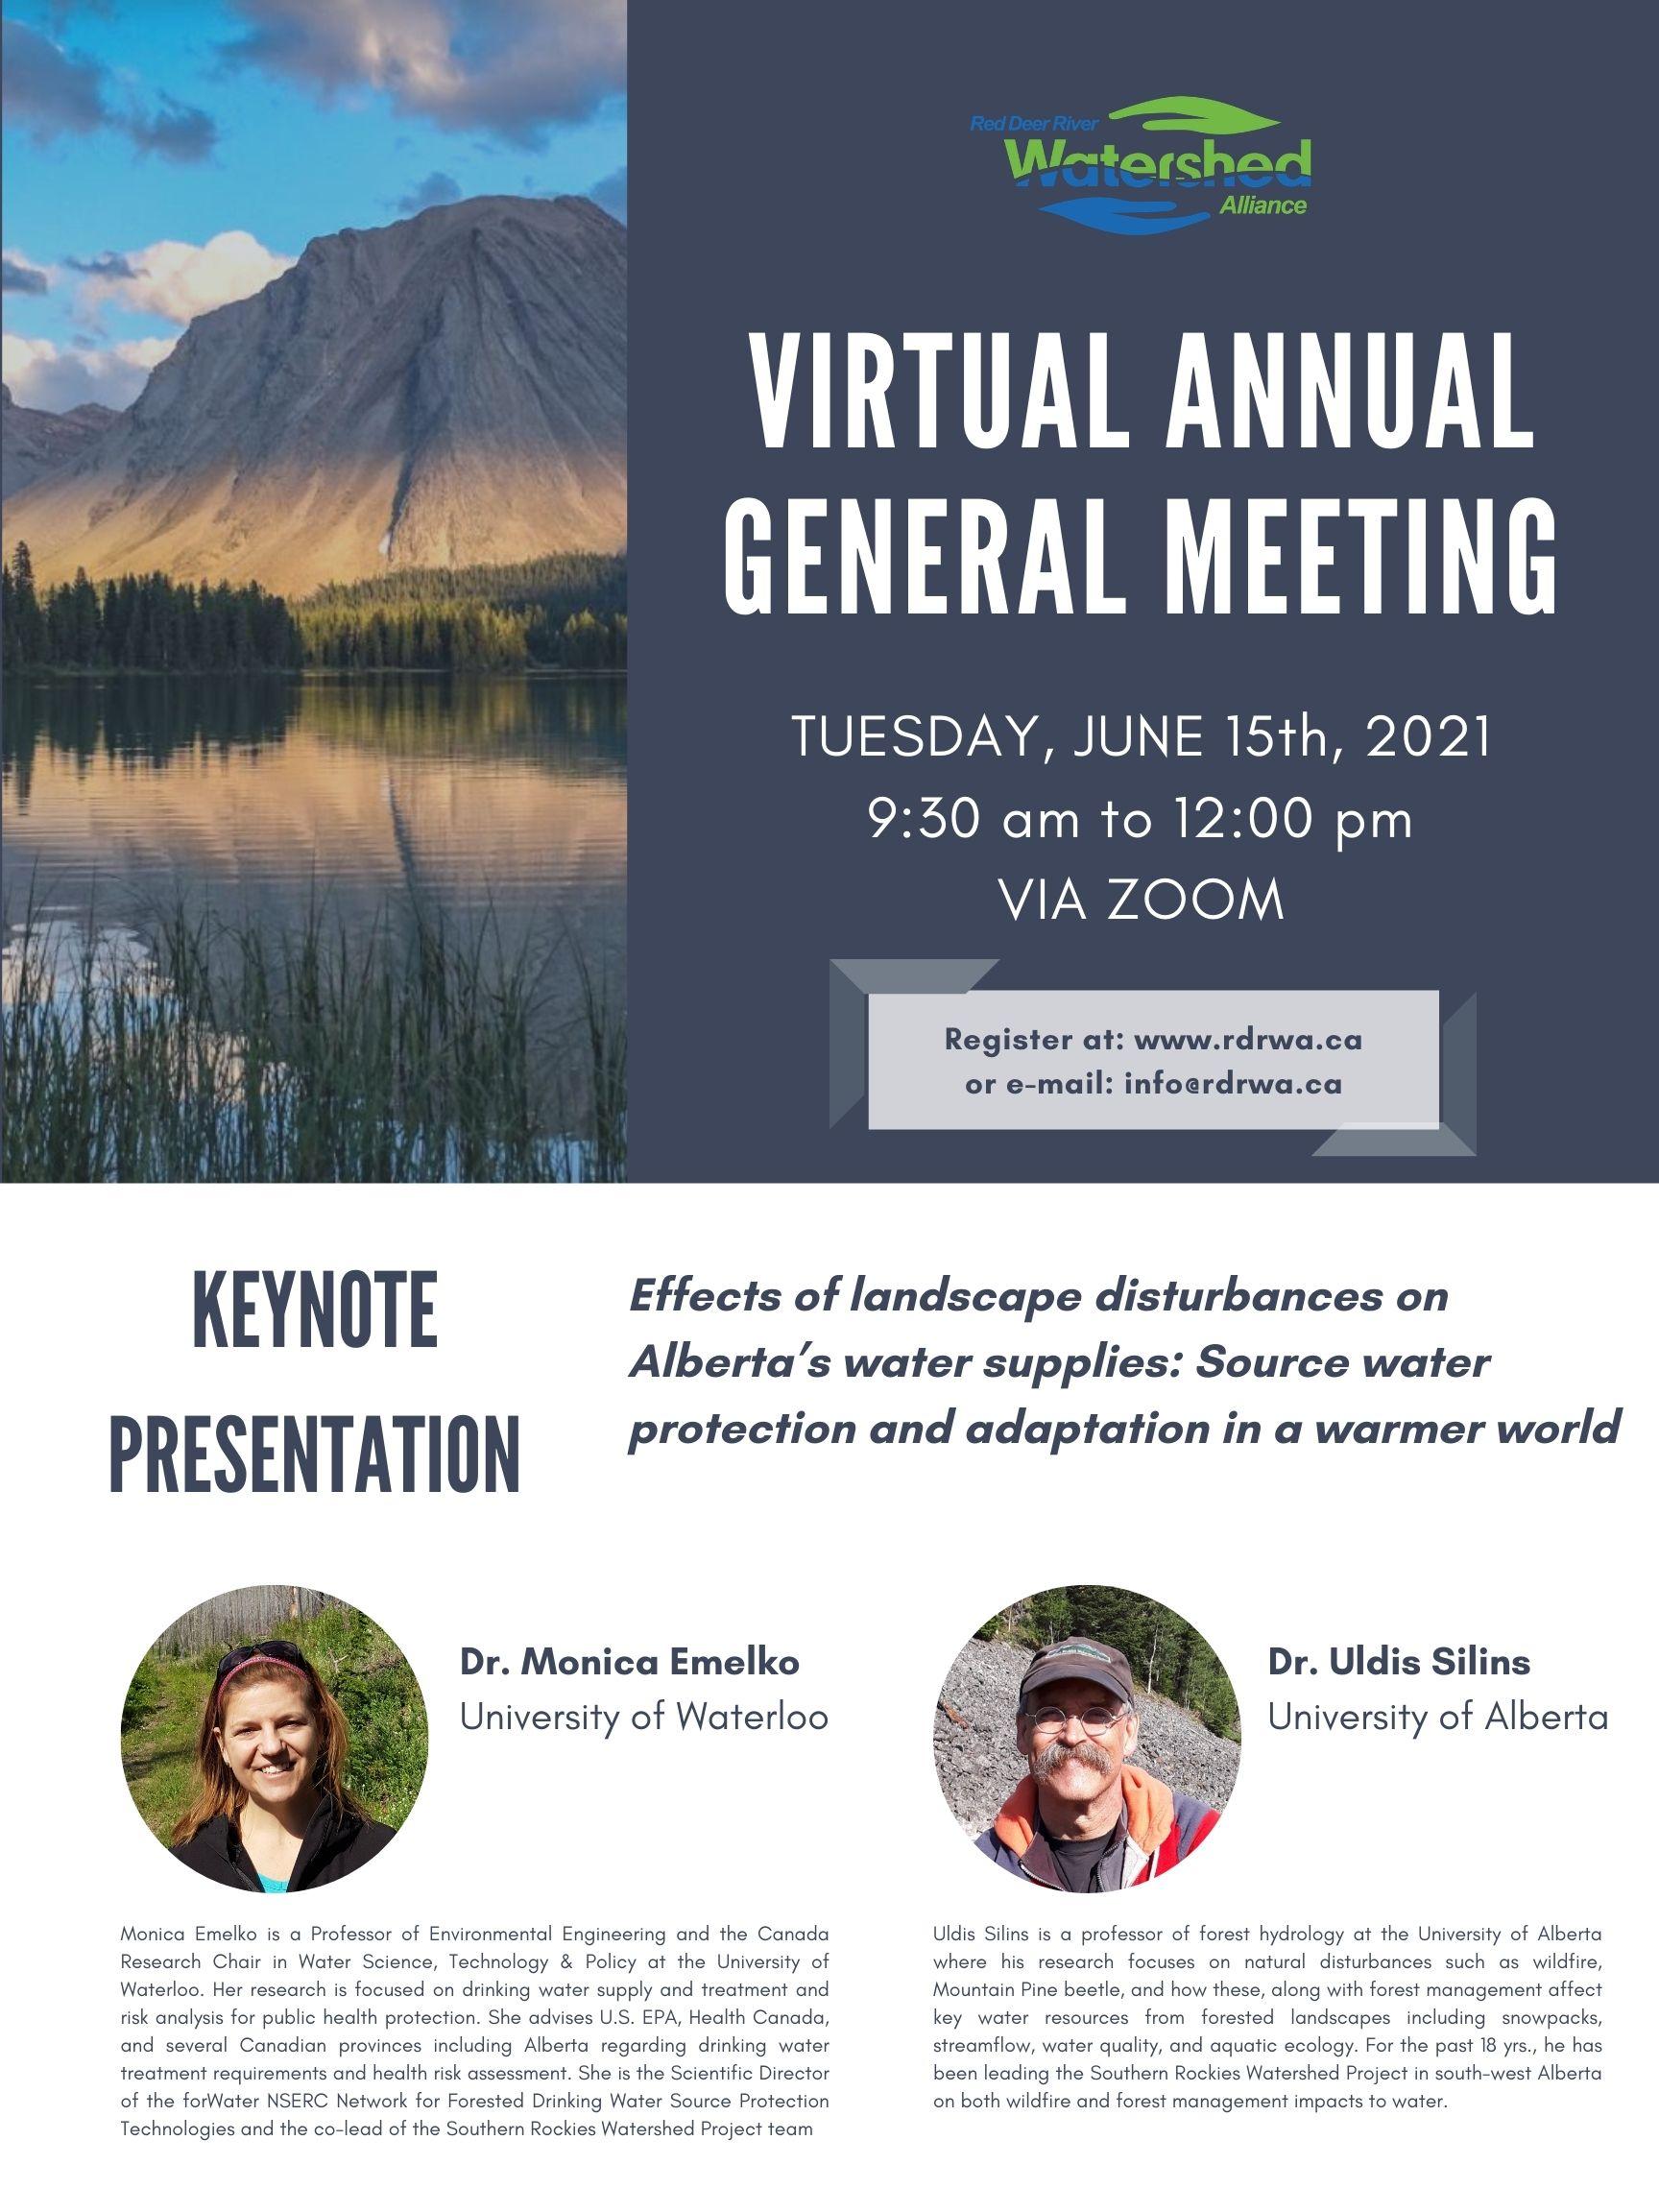 RDRWA Annual General Meeting